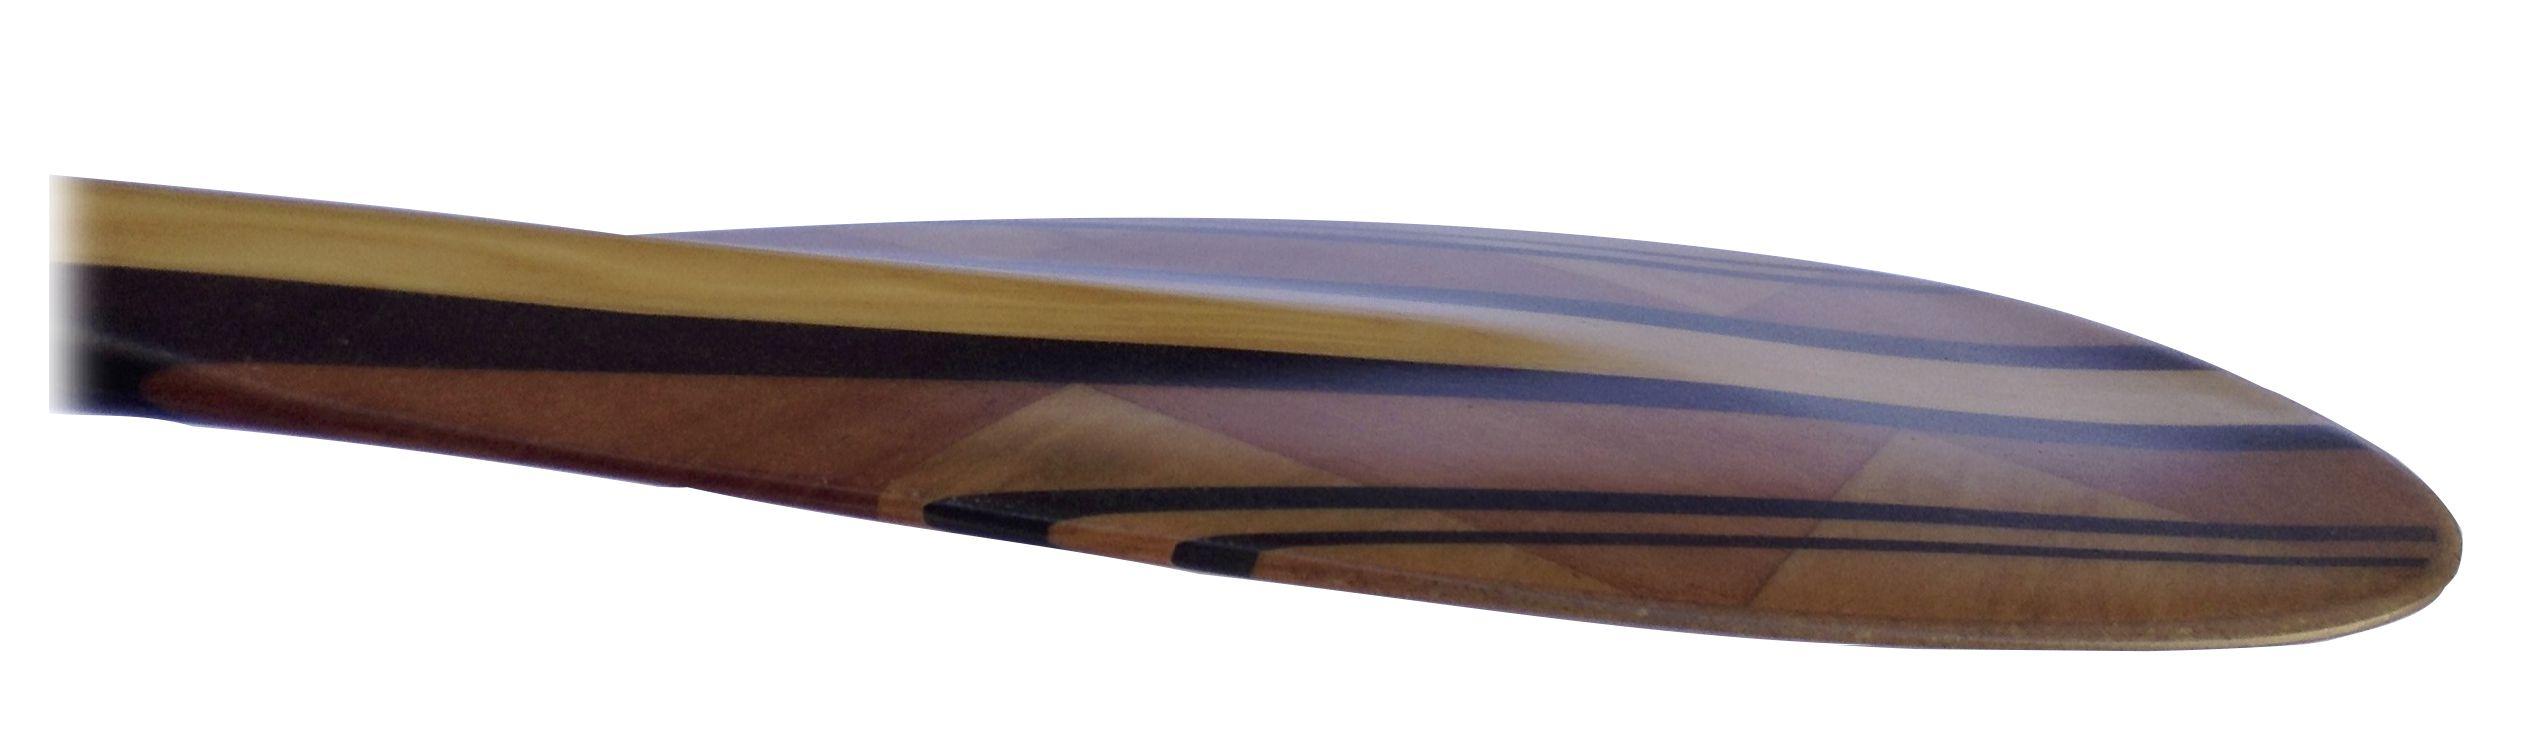 Deppen custom wood canoe paddles - Deppen Sup Paddle Blade Curves